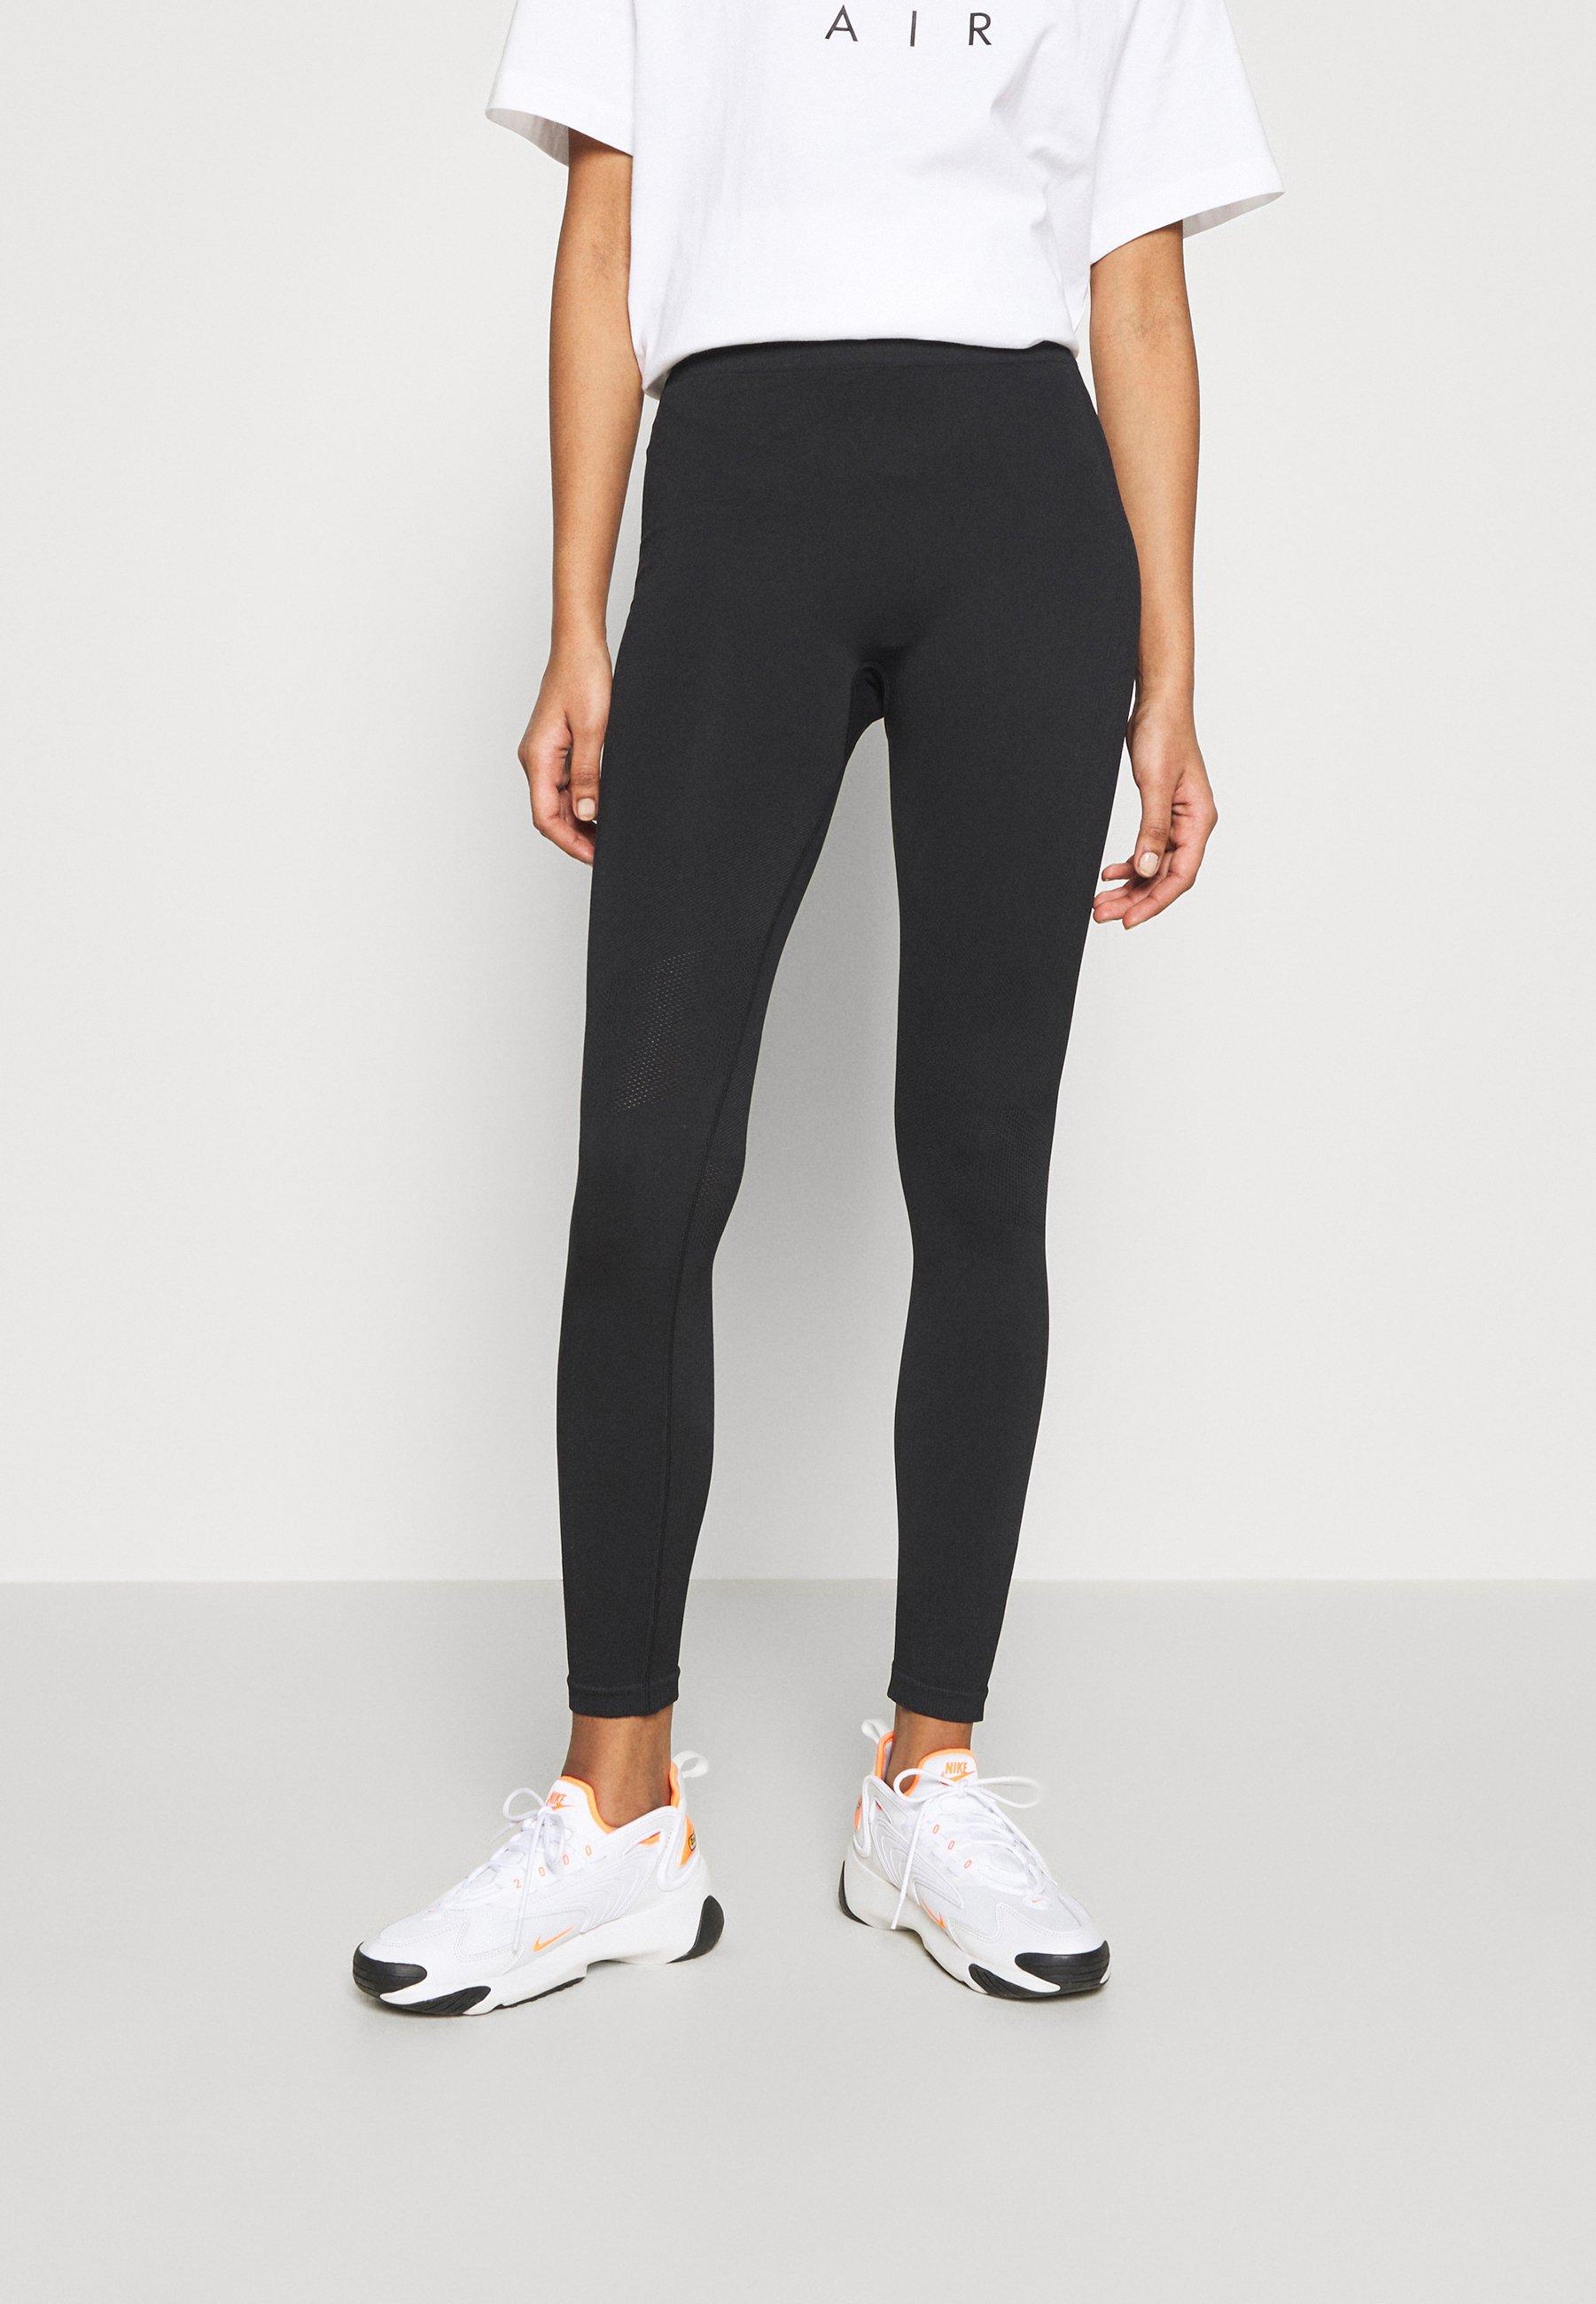 Women CELESTIA SEAMLESS TIGHTS - Leggings - Trousers